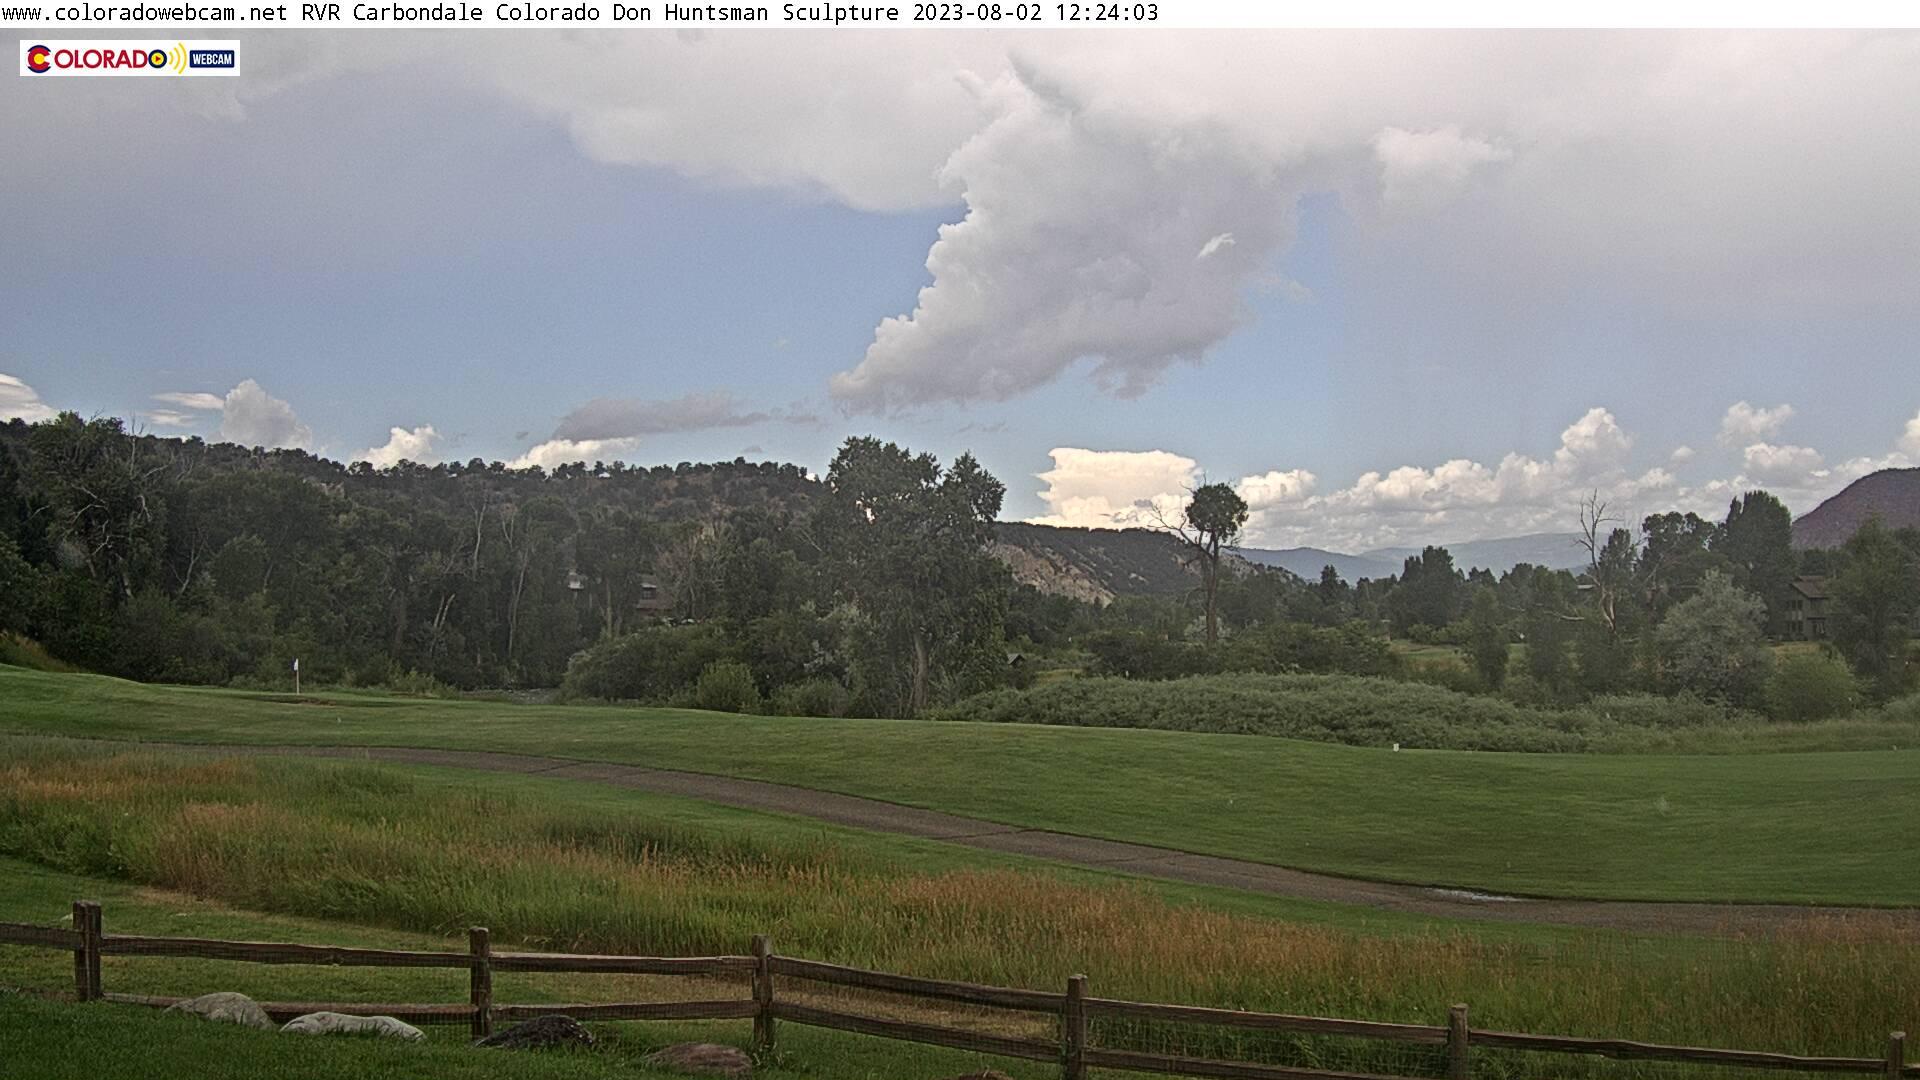 Aspen Ski Mountain Gondola Webcam Coloradowebcam Net